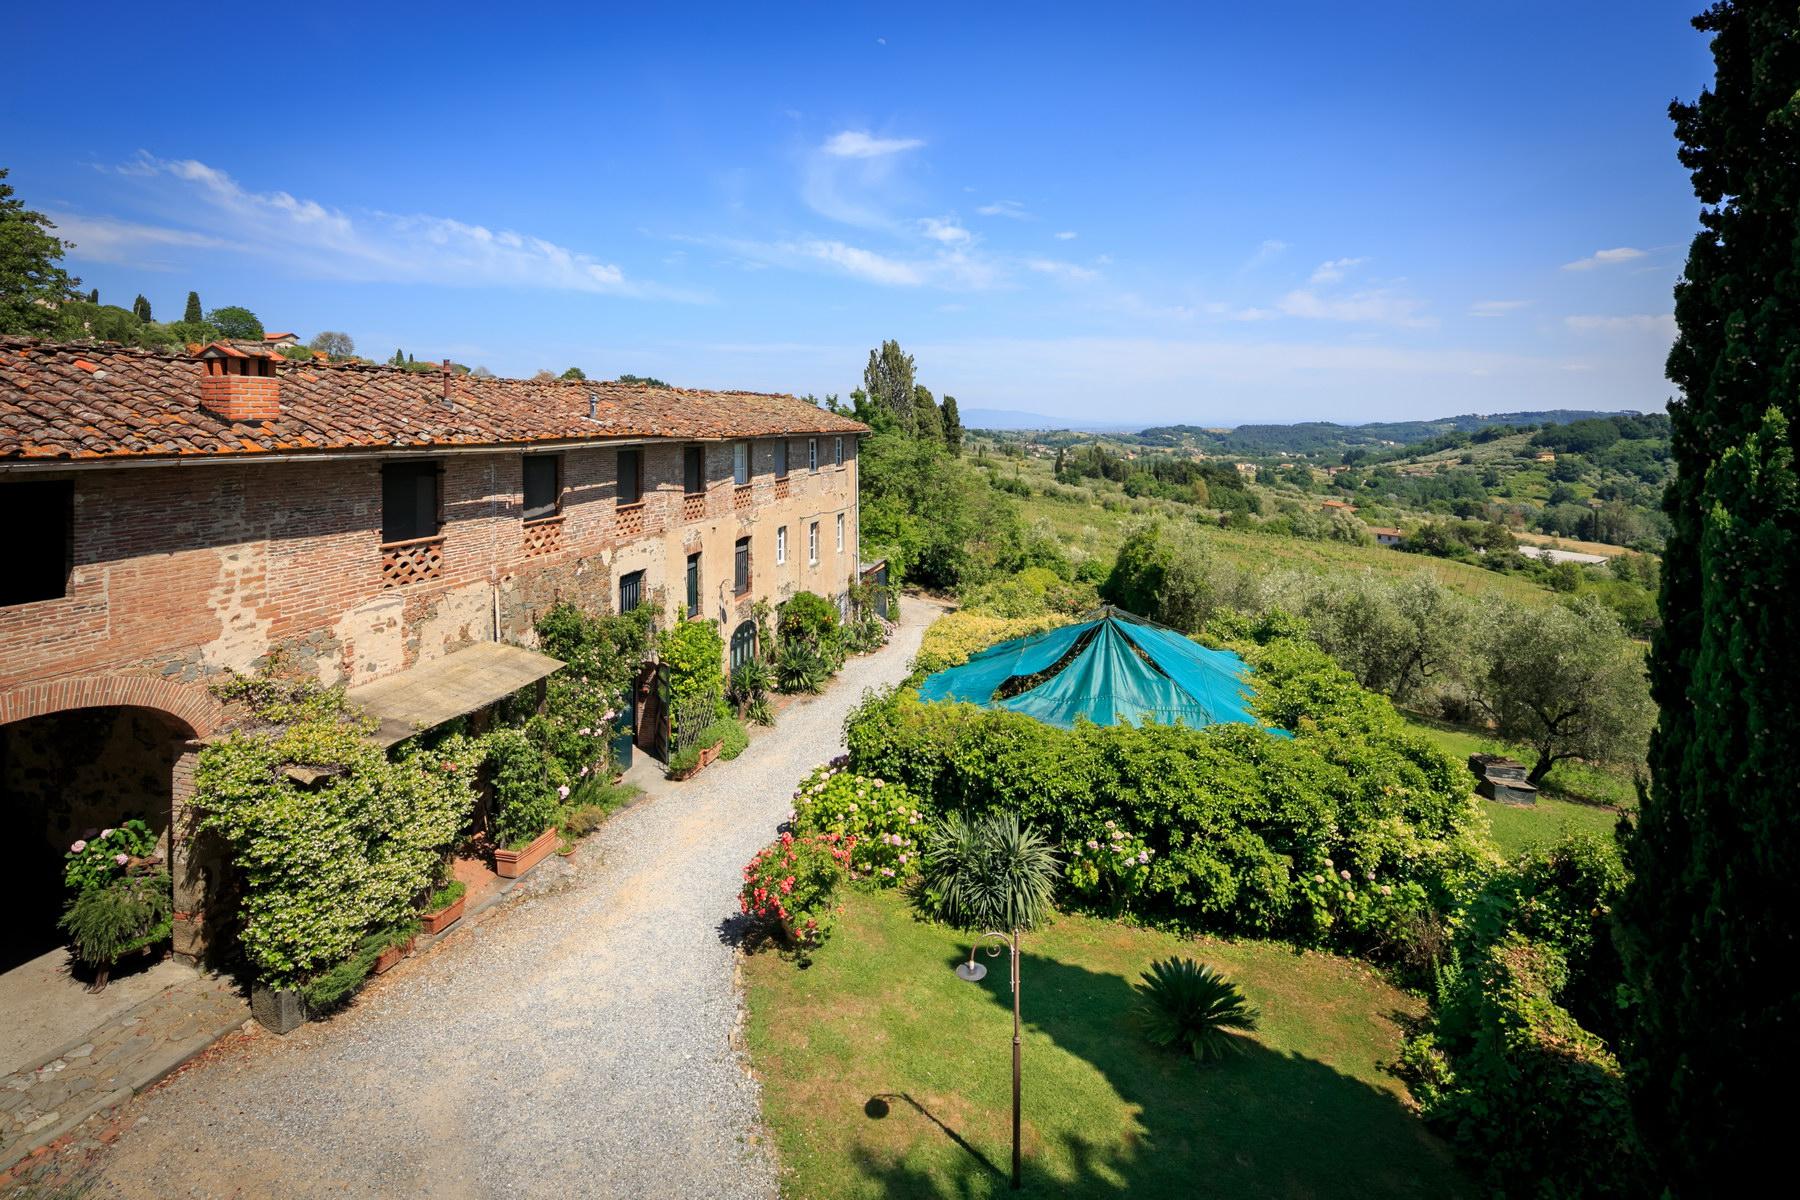 Villa in Vendita a Capannori: 5 locali, 570 mq - Foto 27